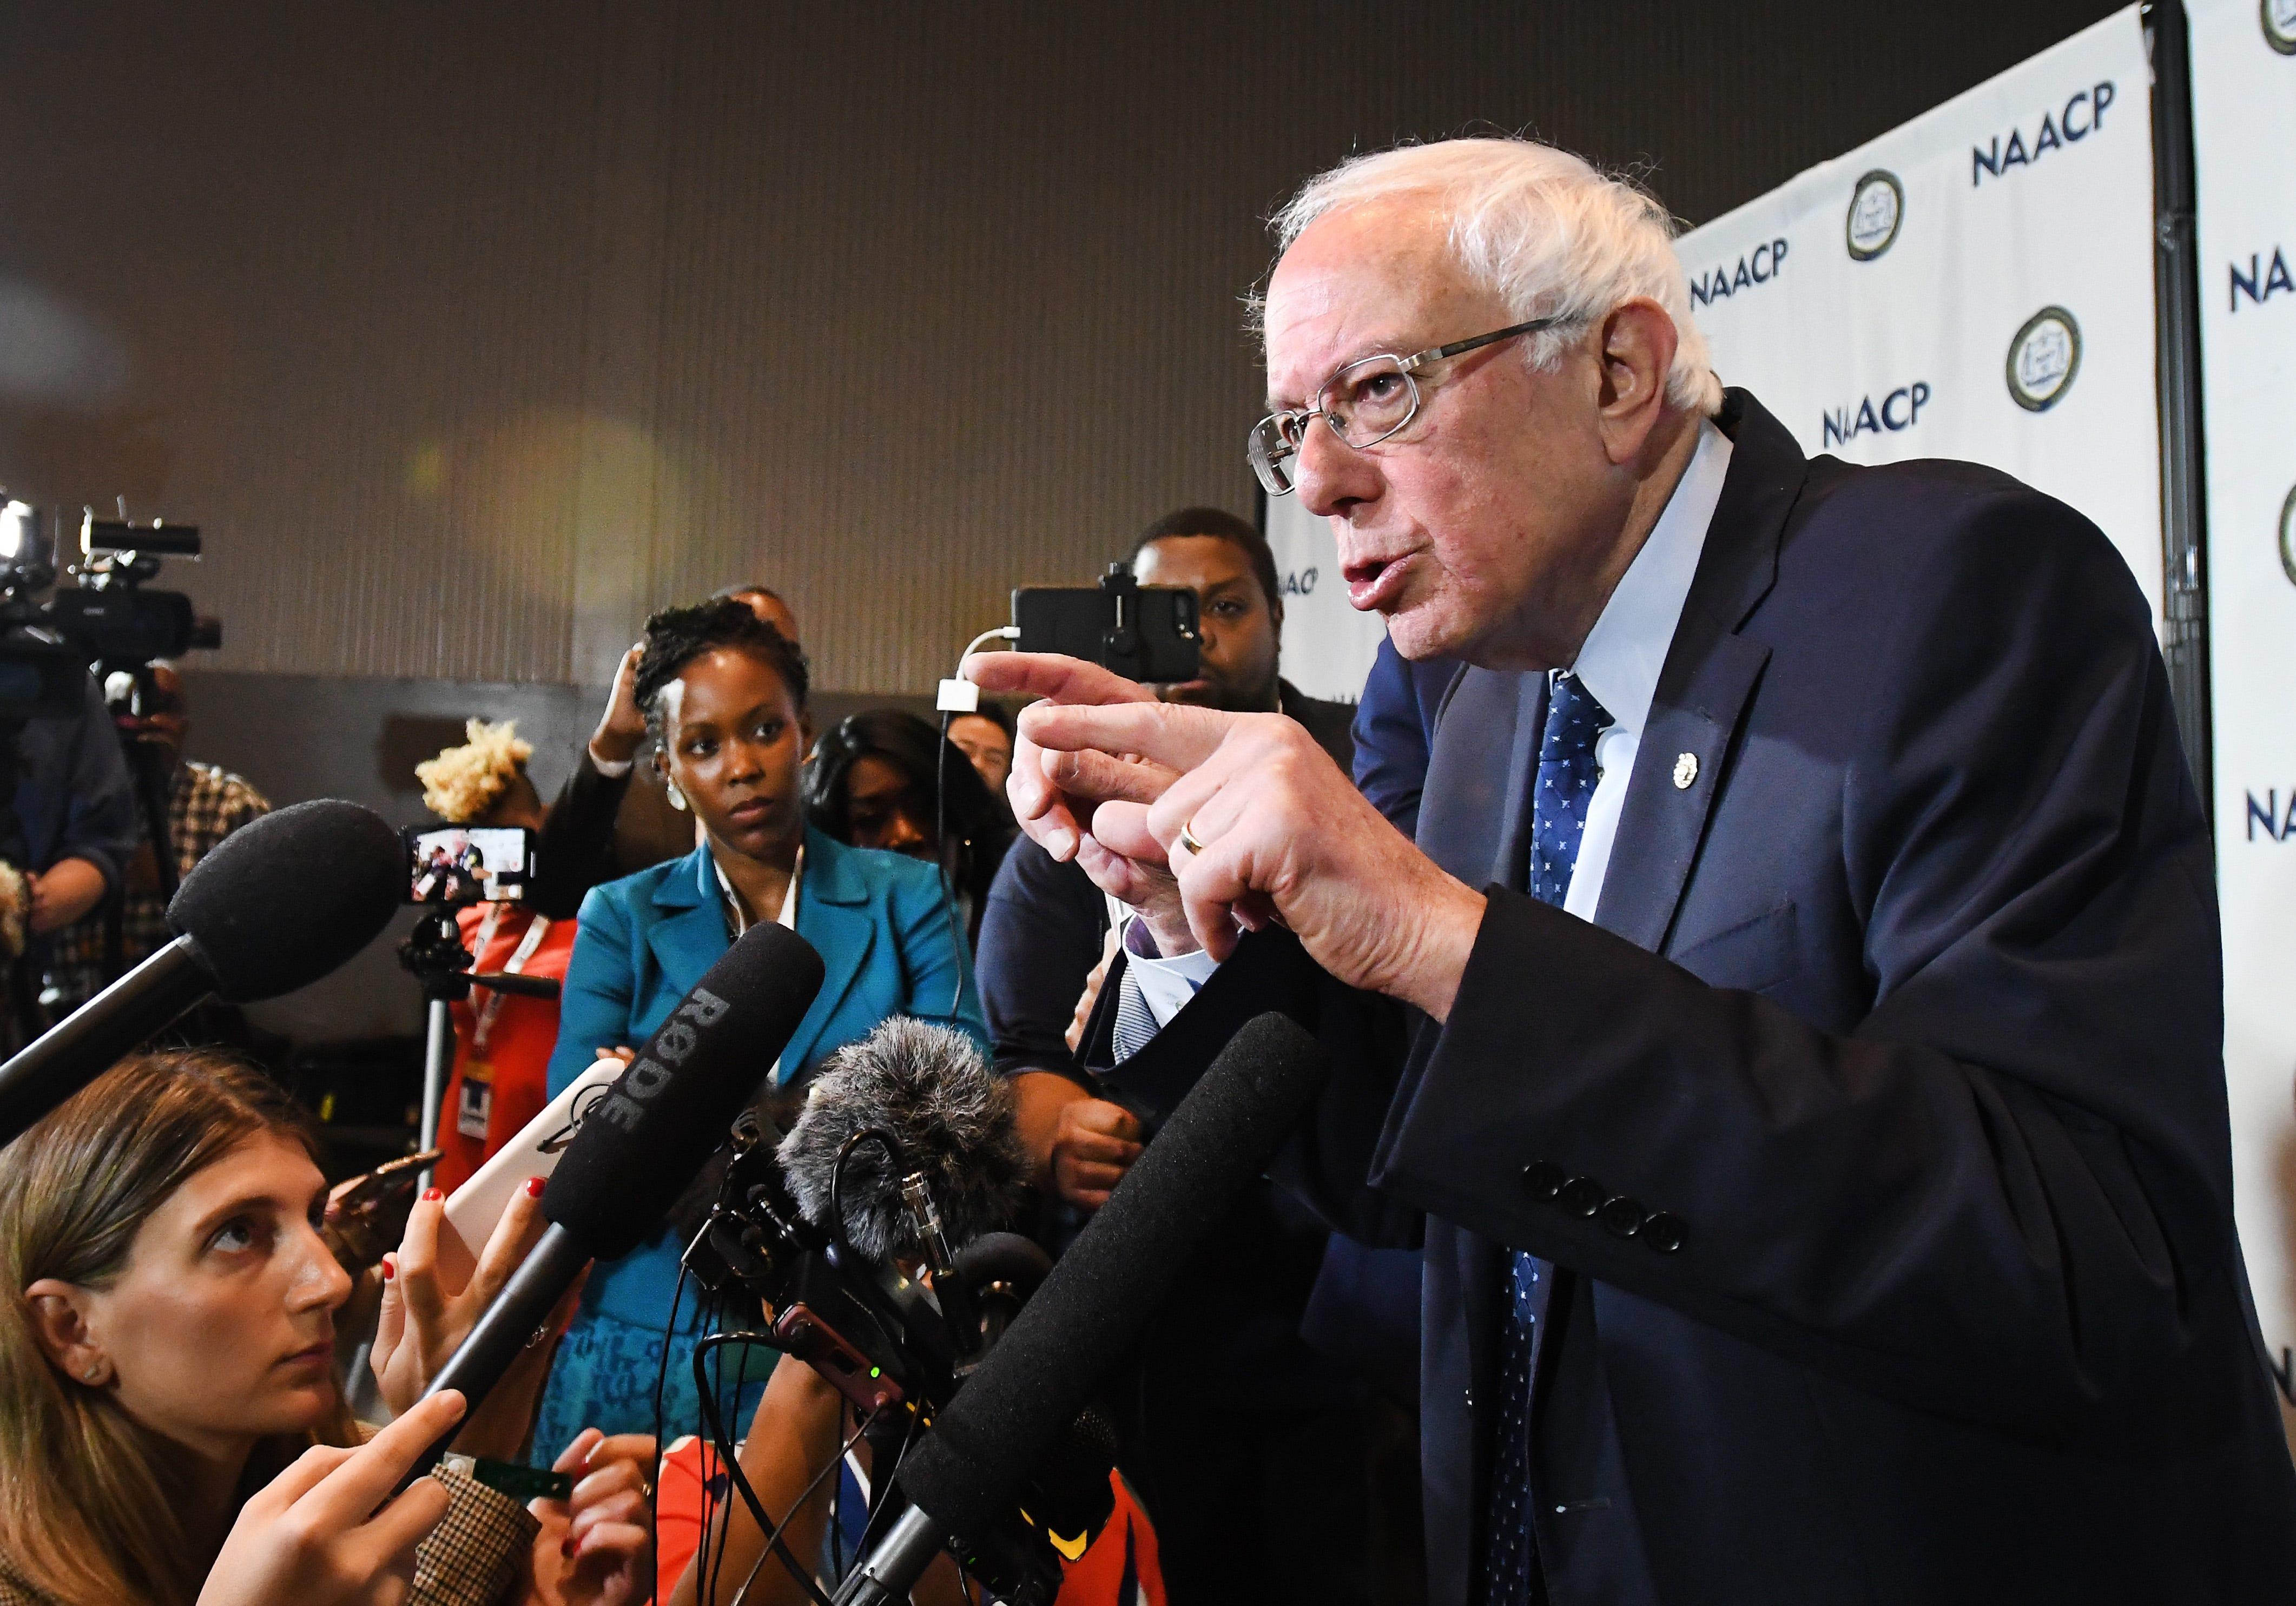 Bernie Sanders backs Line 5 shutdown